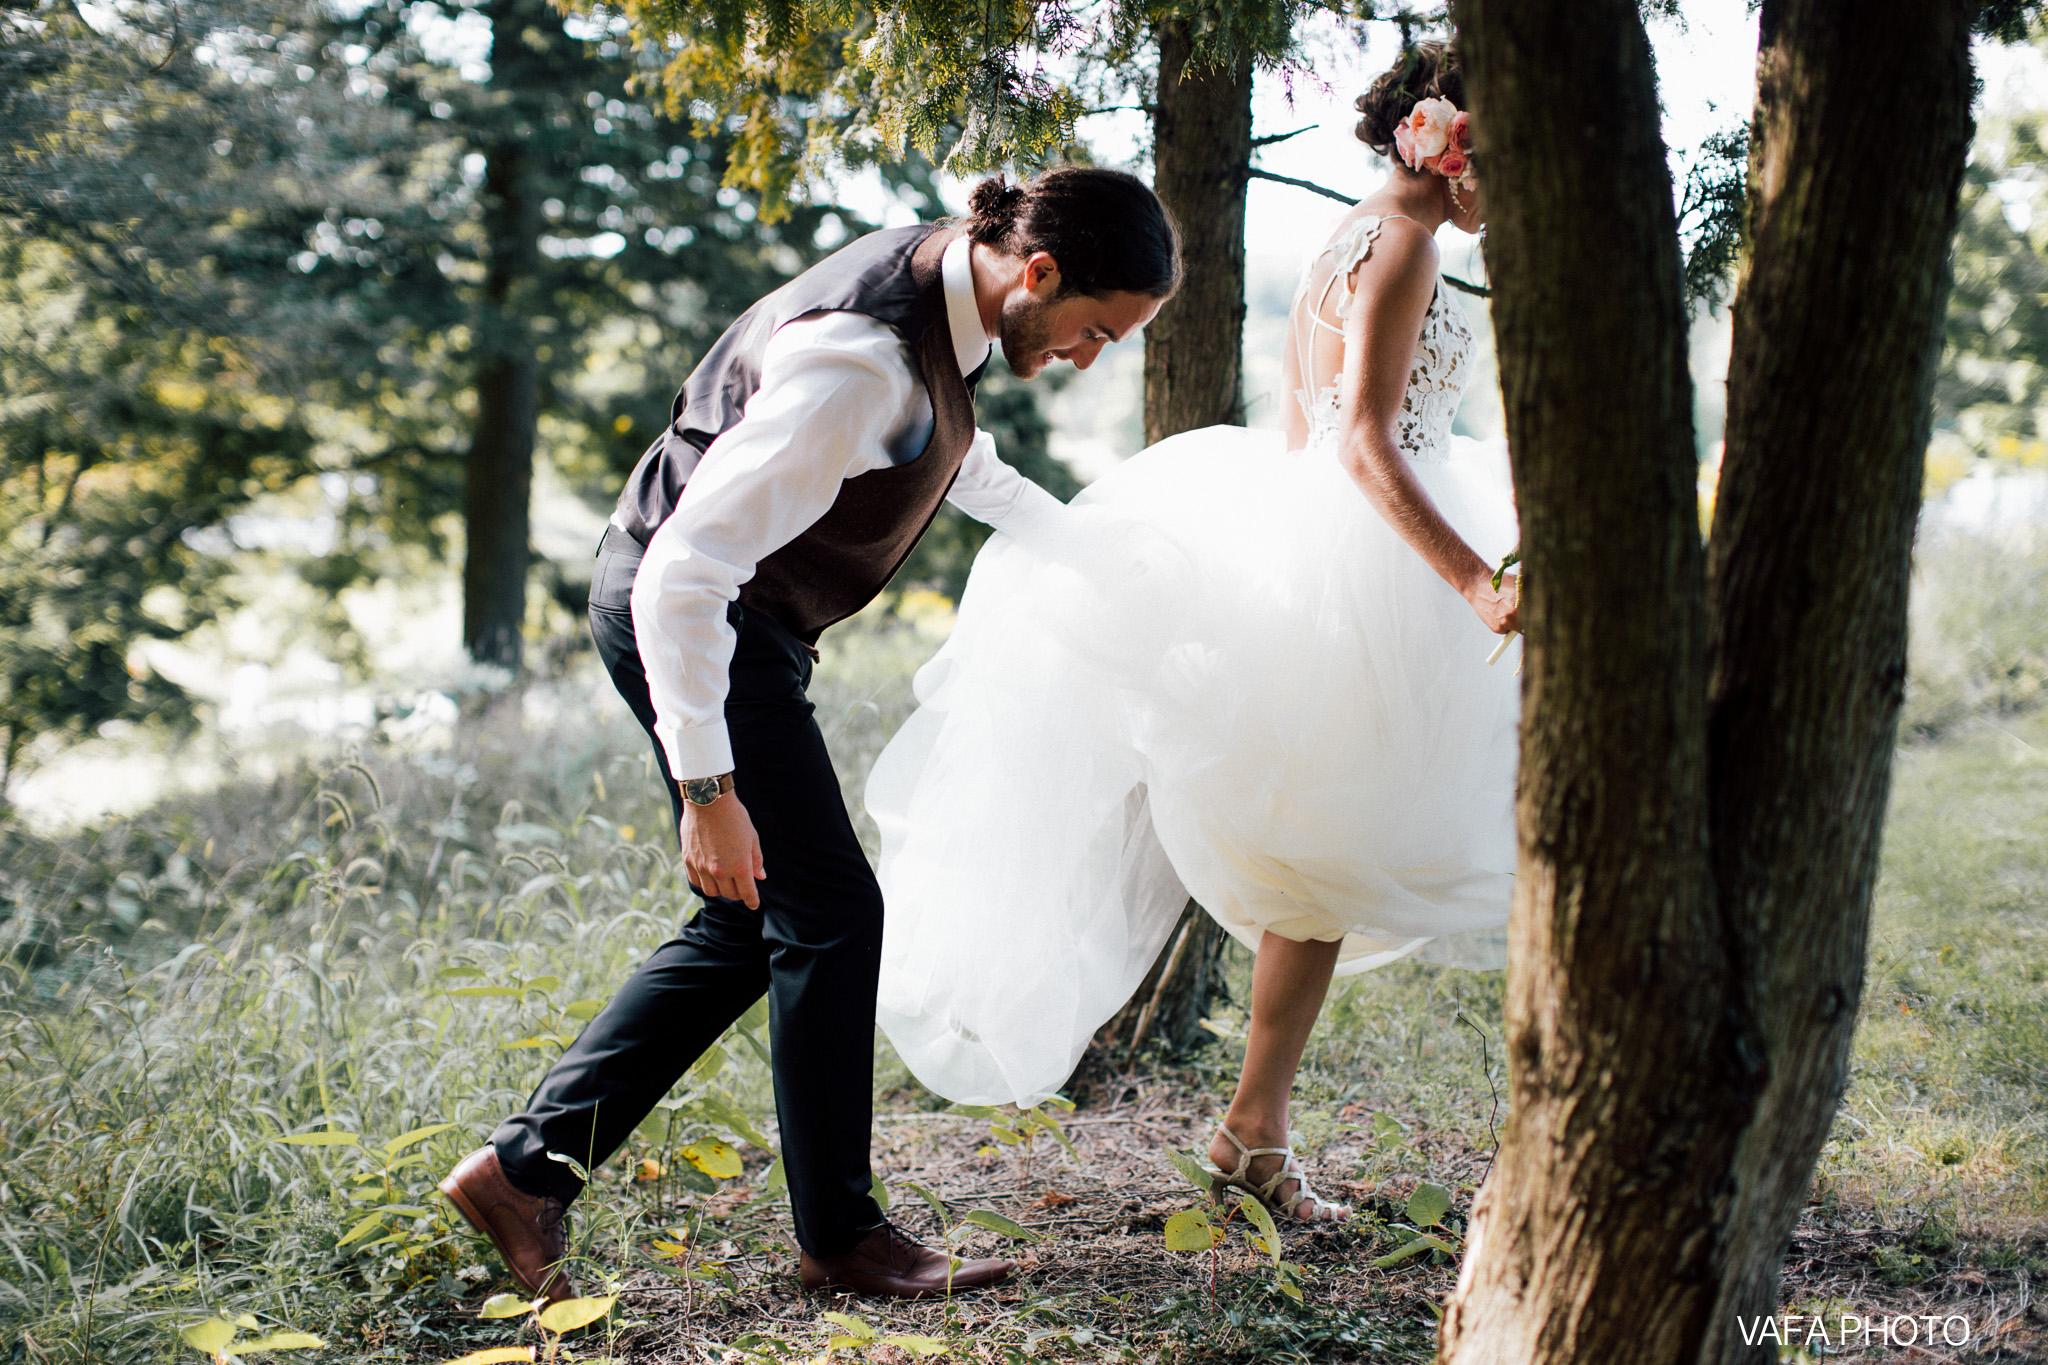 The-Felt-Estate-Wedding-Kailie-David-Vafa-Photo-788.jpg